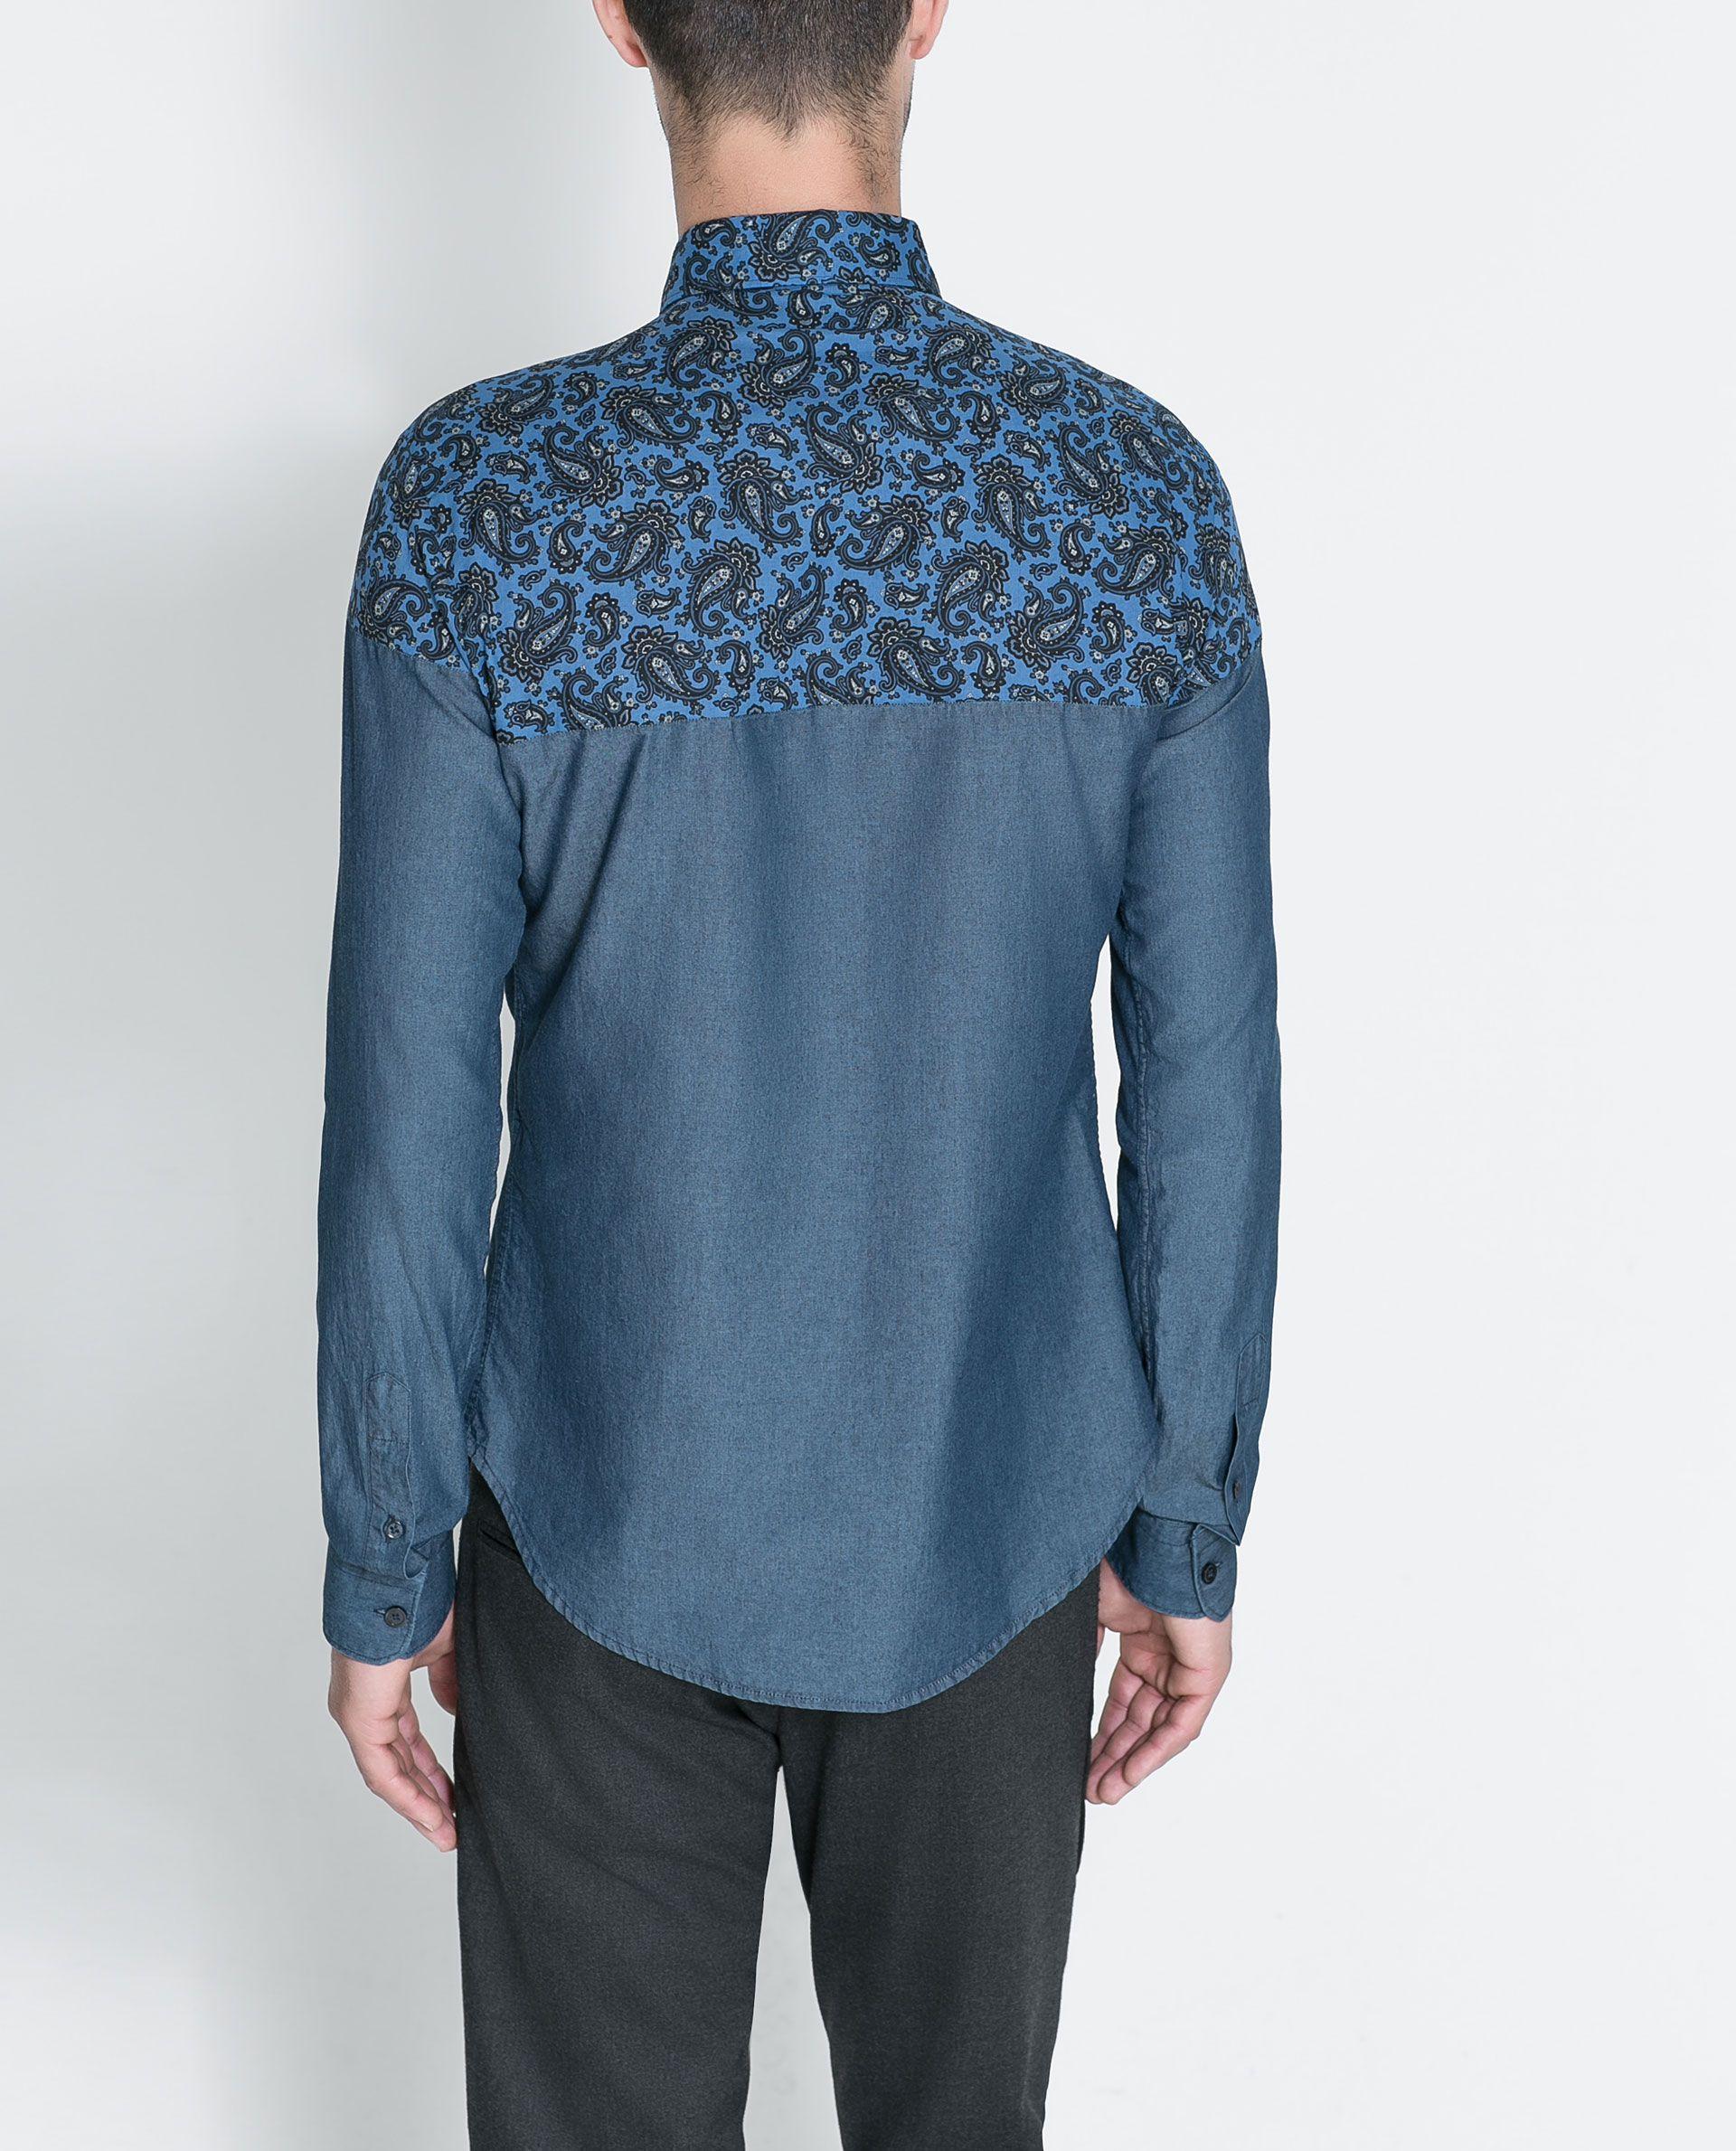 962d2aa708 CAMISA DENIM ESTAMPADO CACHEMIRES - Camisas - Hombre